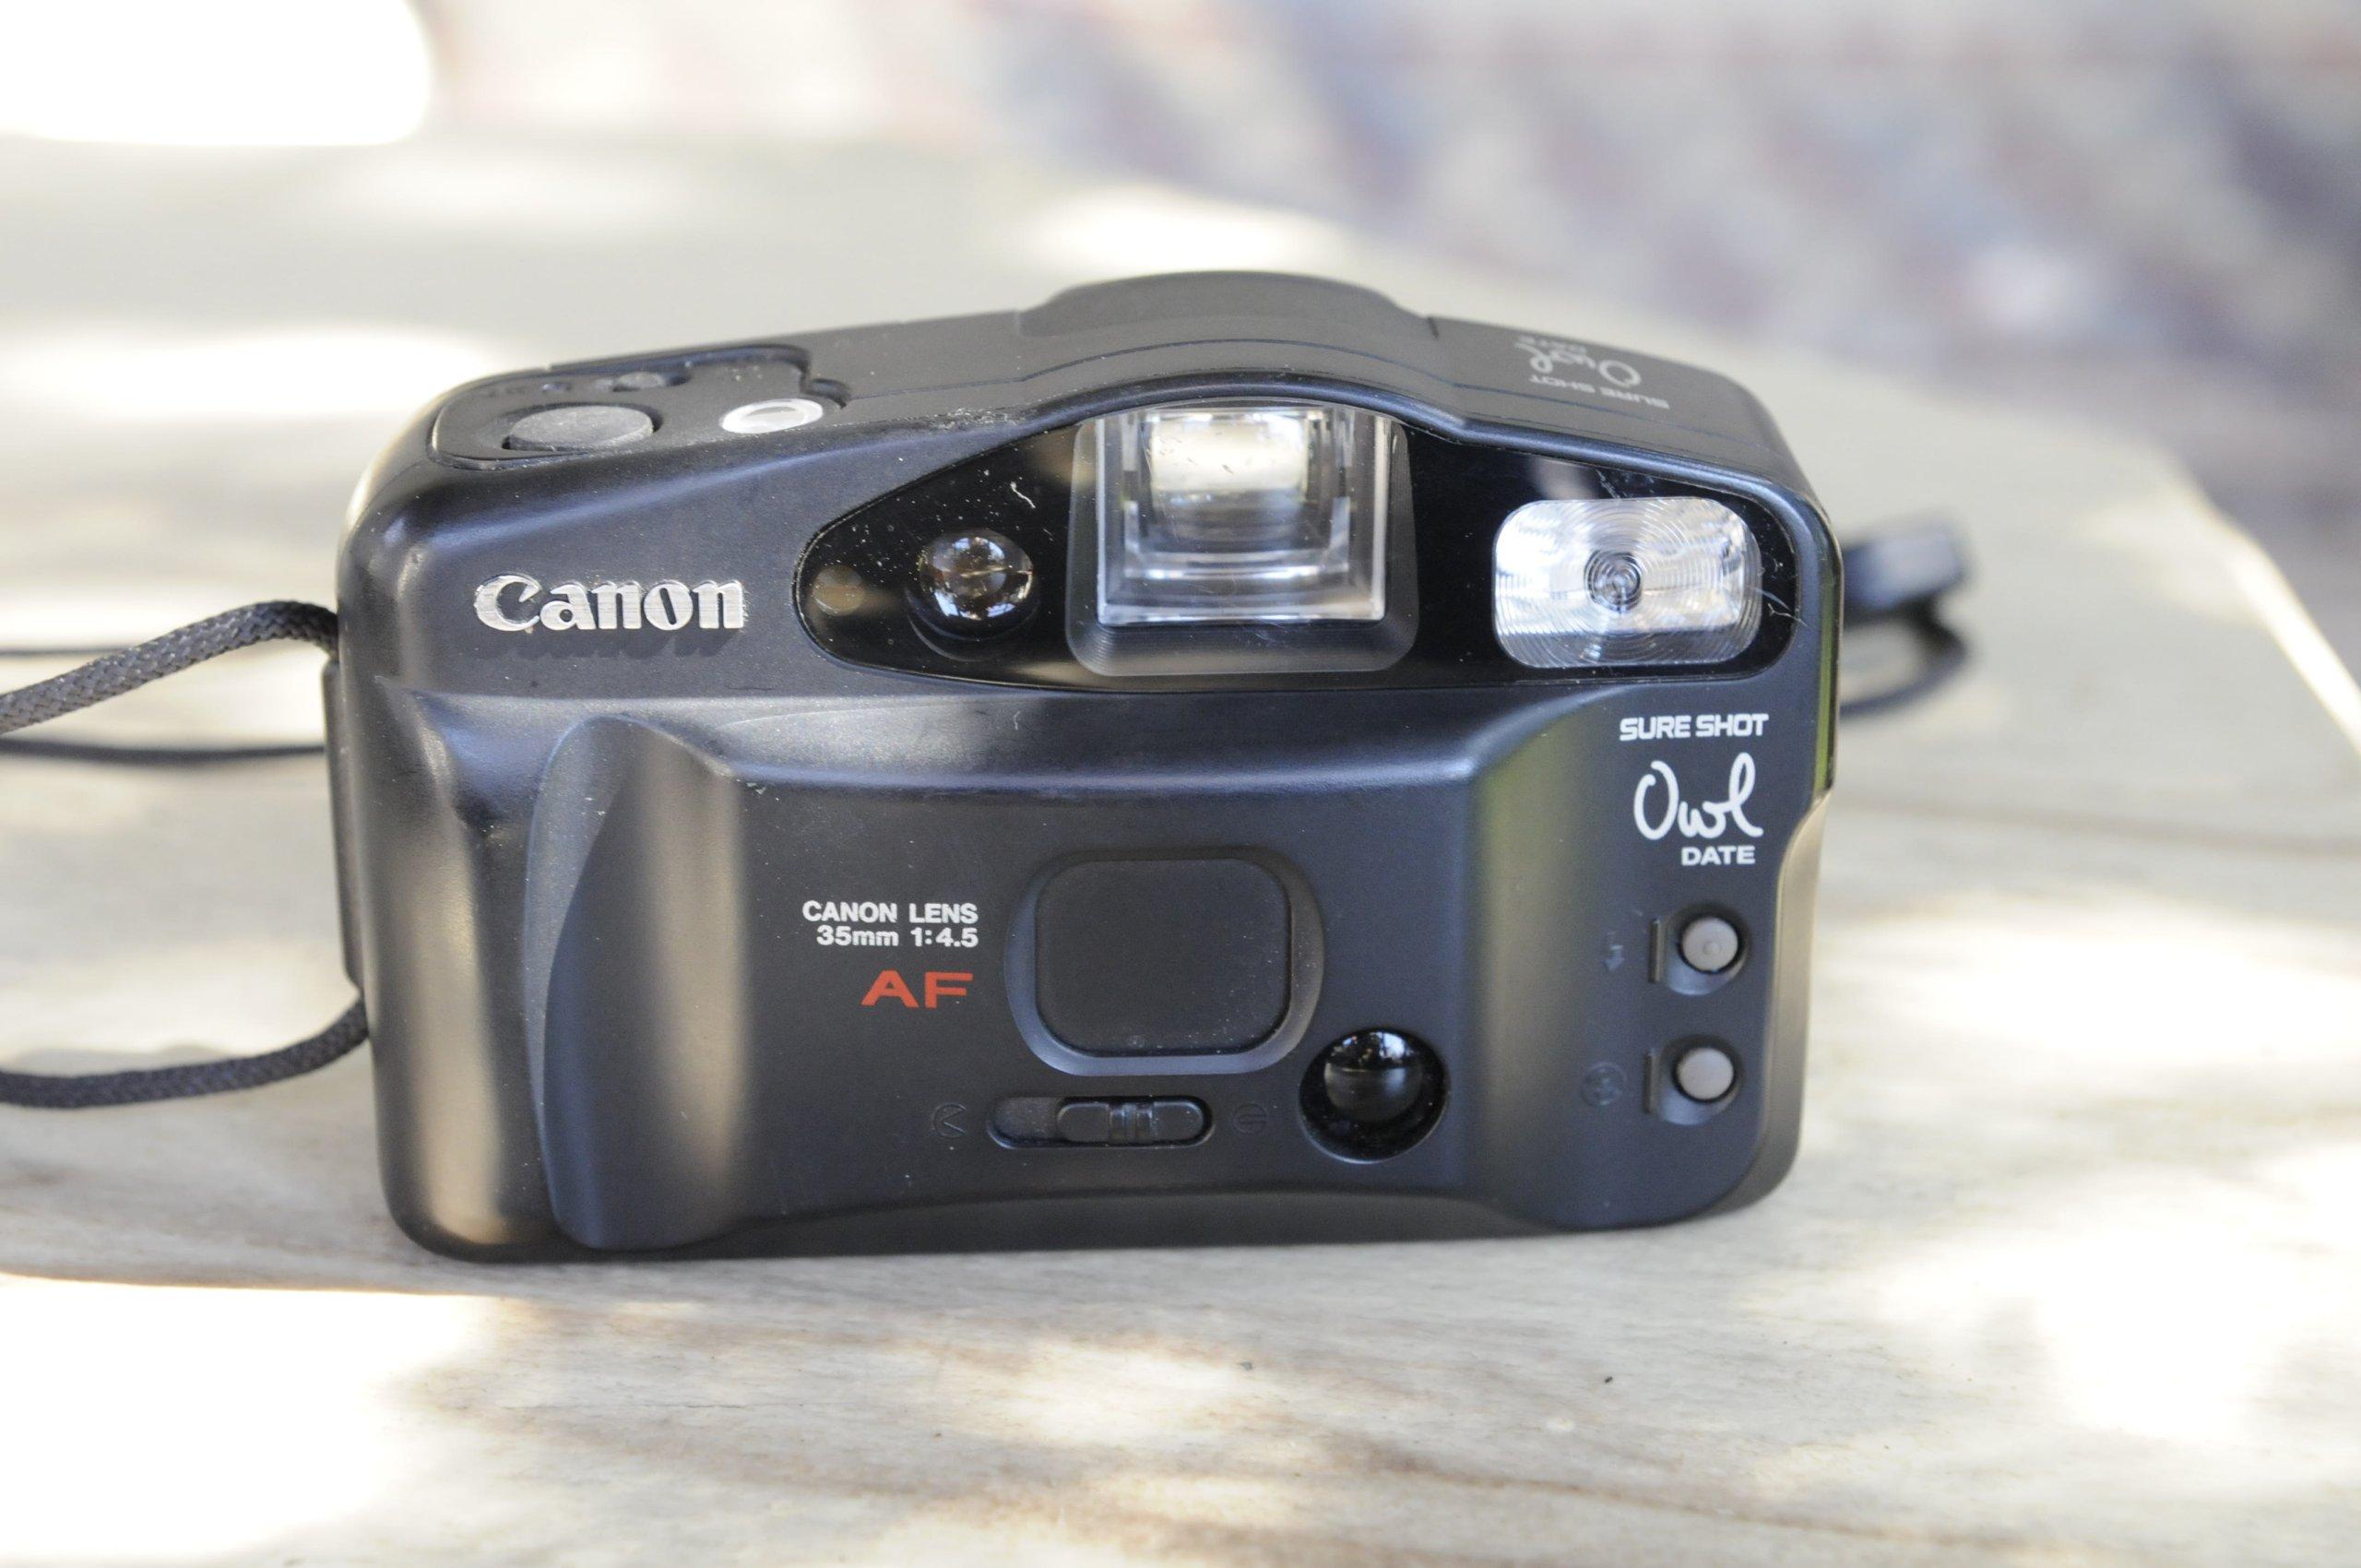 Dating canon lenses